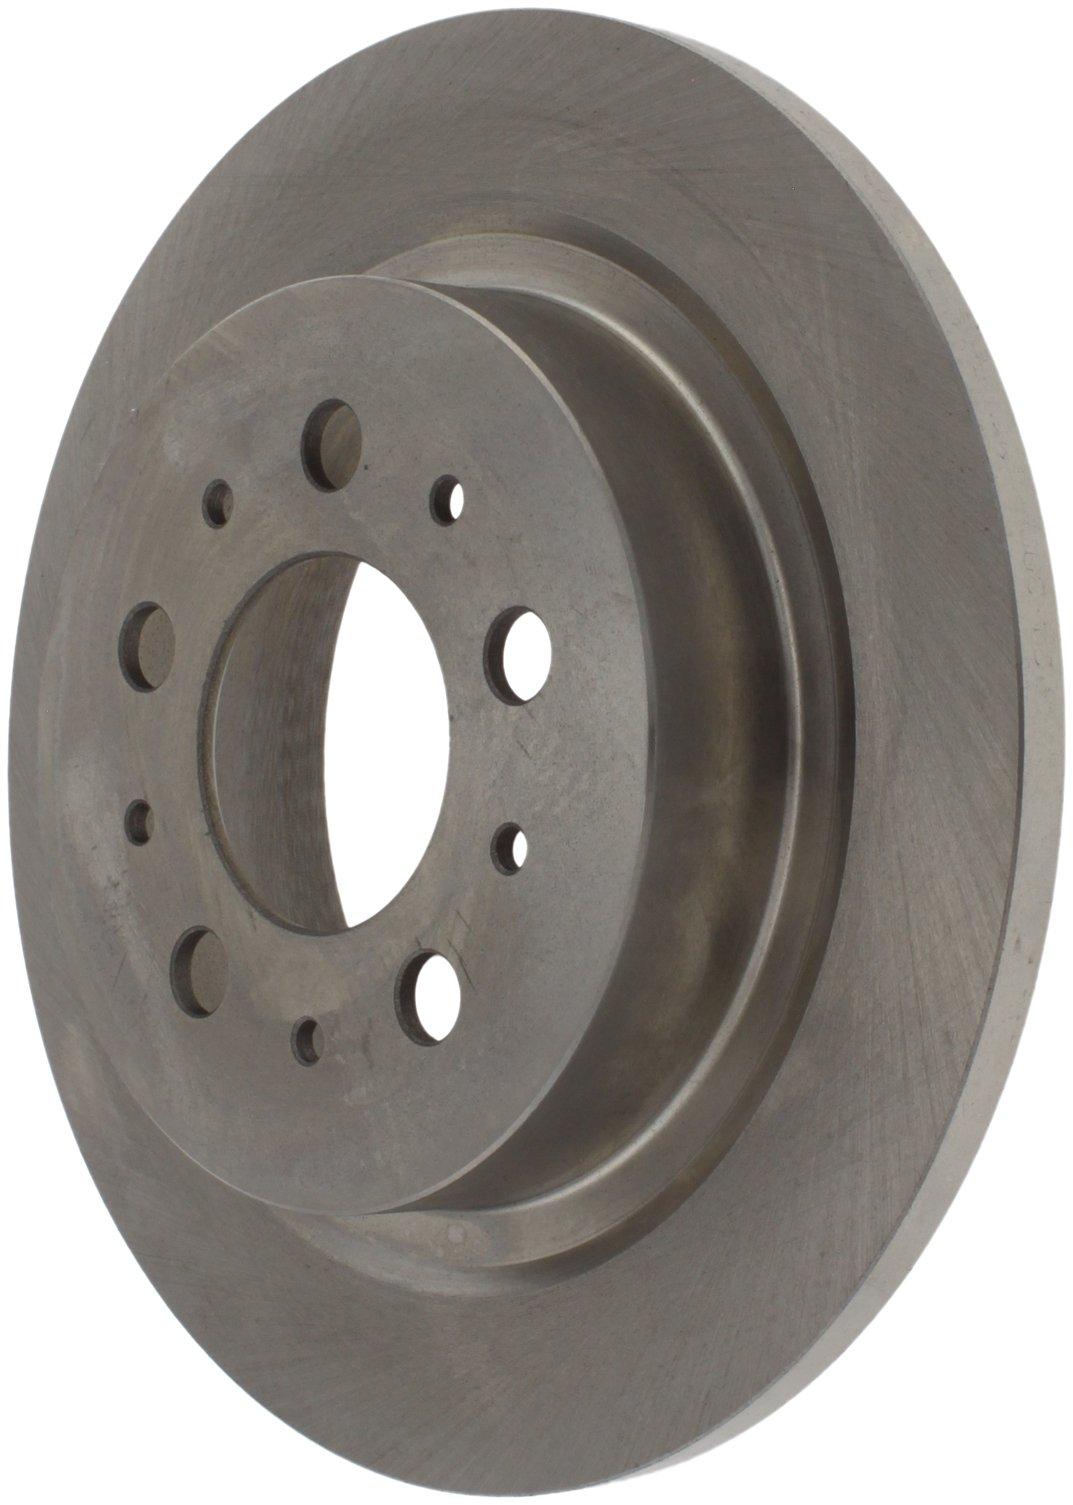 Raybestos 96516 Advanced Technology Disc Brake Rotor